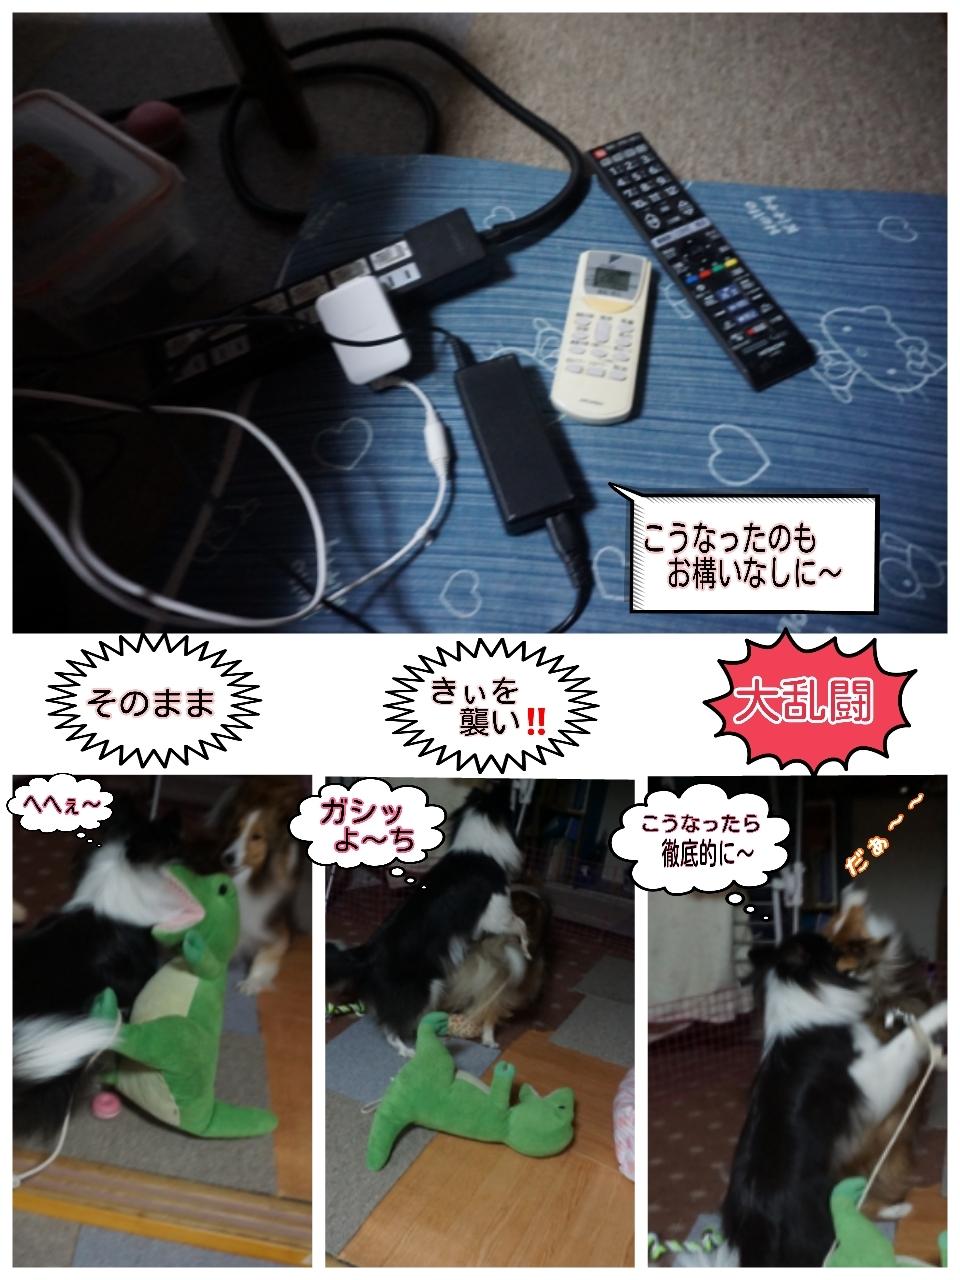 16-11-25-07-28-17-266_deco.jpg